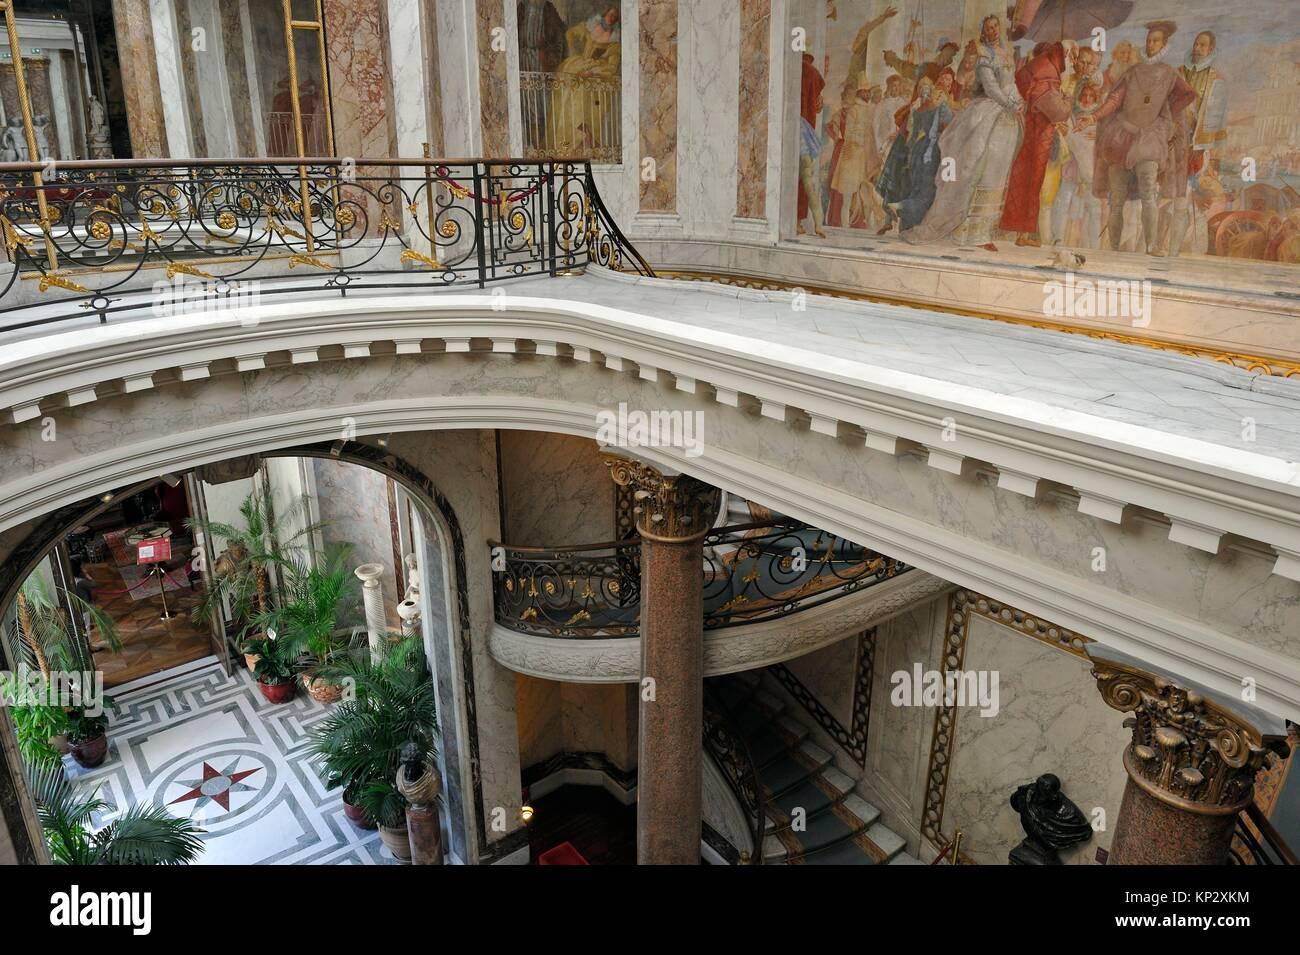 Der Wintergarten et die Treppe des Jacquemart-Andre Museum, Eigentum des Institut de France, 8. Arrondissement, Stockbild